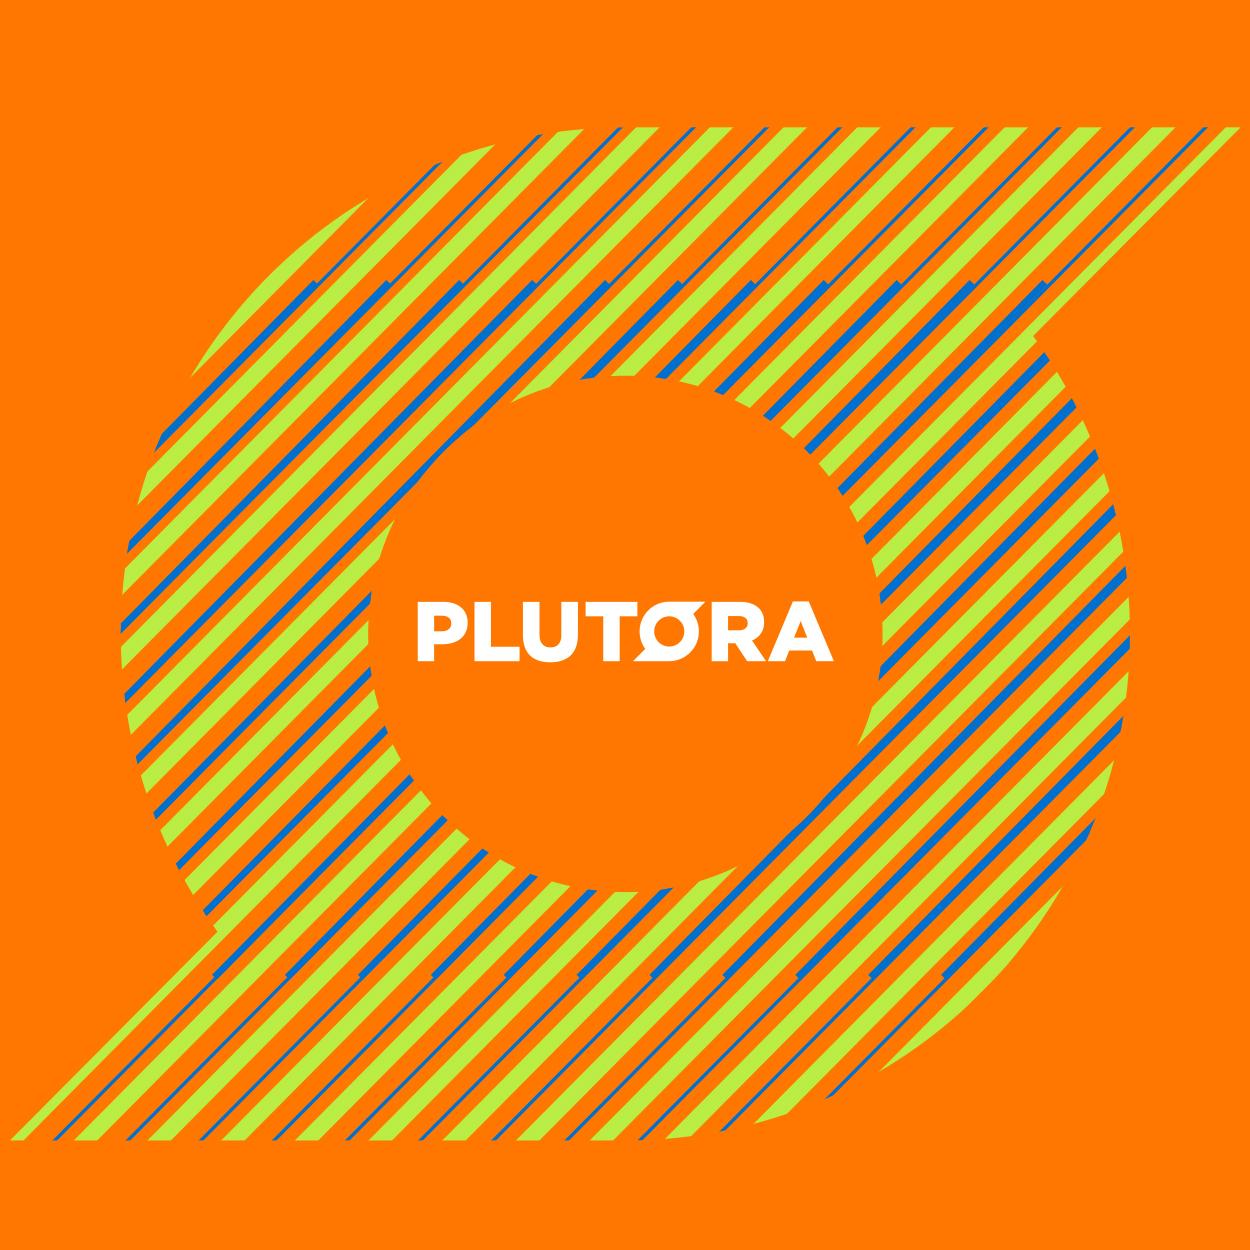 Plutora_Reject1.jpg